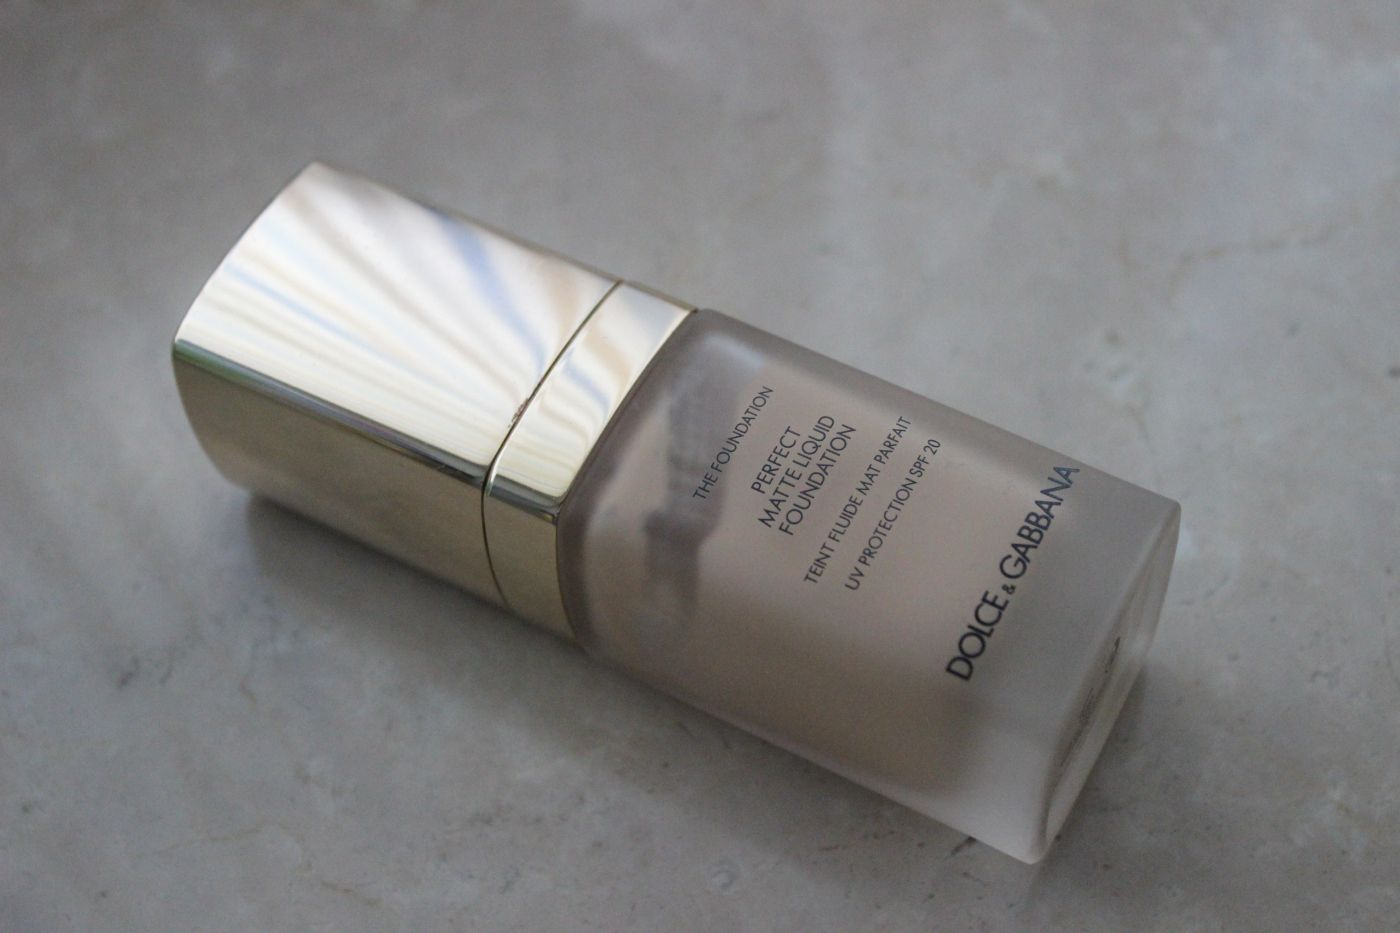 dolce-e-gabbana-perfect-matt-liquid-foundation